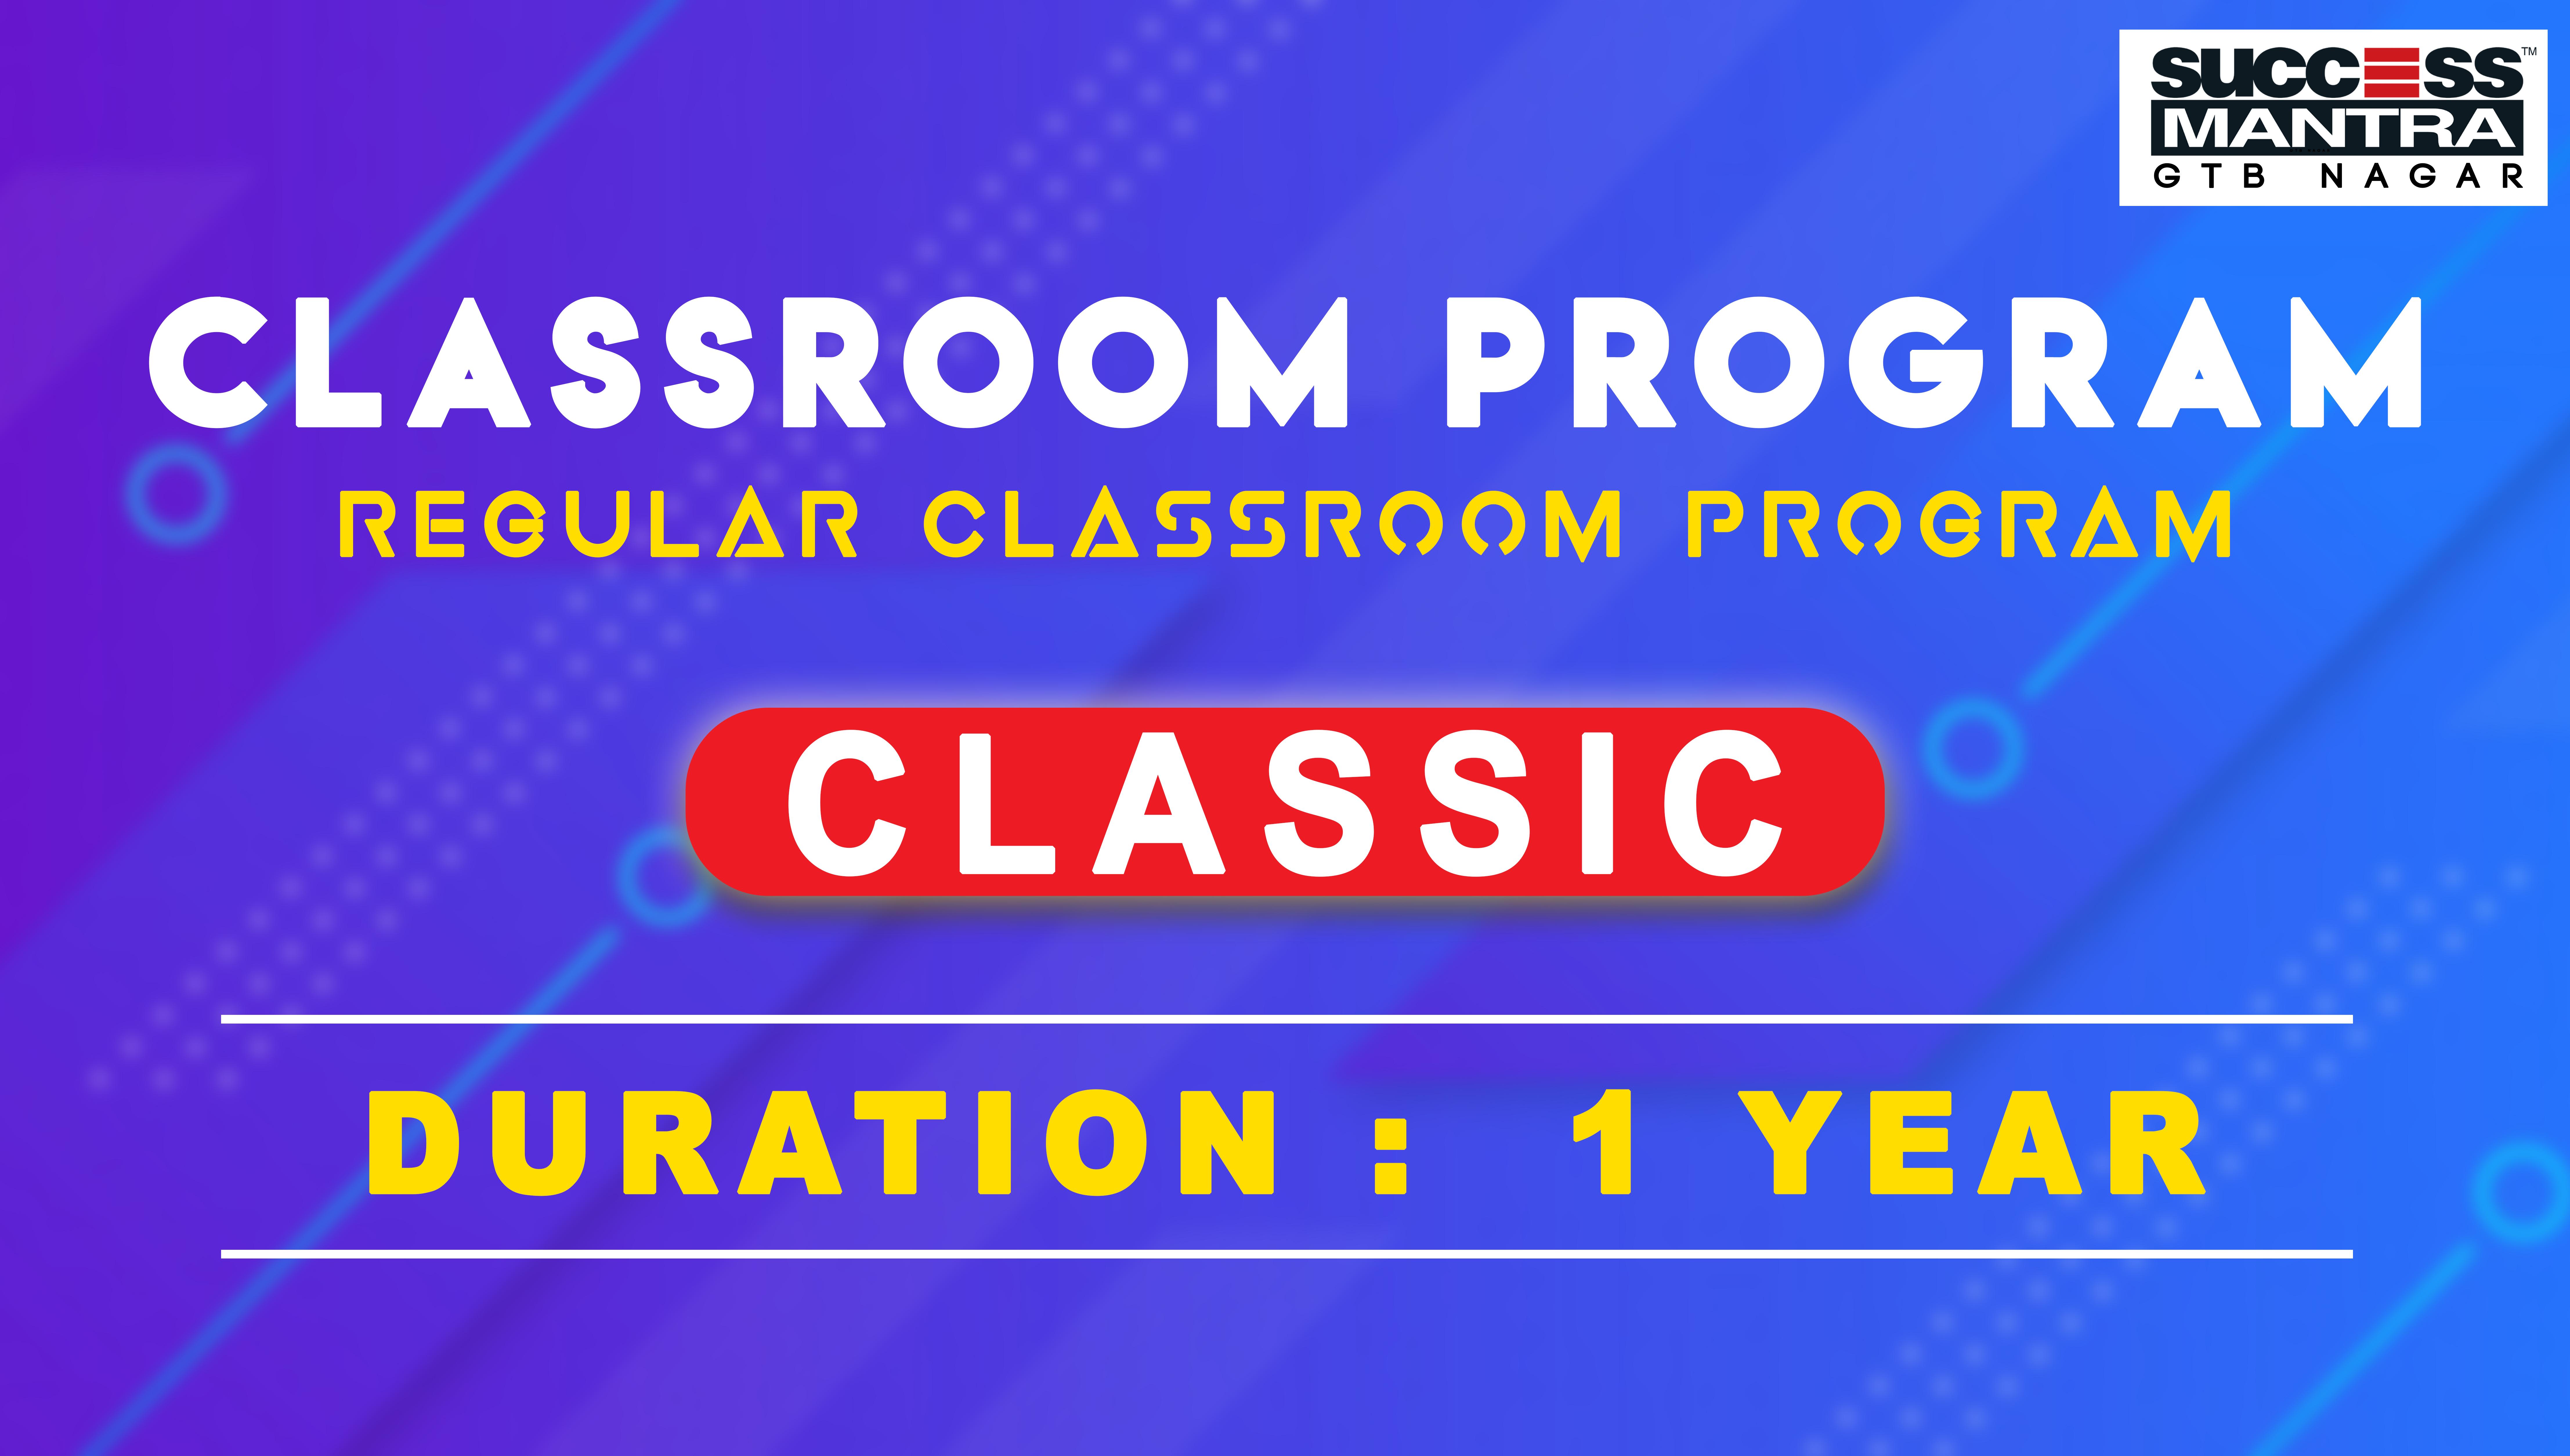 CLAT Classroom Coaching Program | CLASSIC One year Law Course at Success Mantra | Success Mantra Coaching G.T.B Nagar